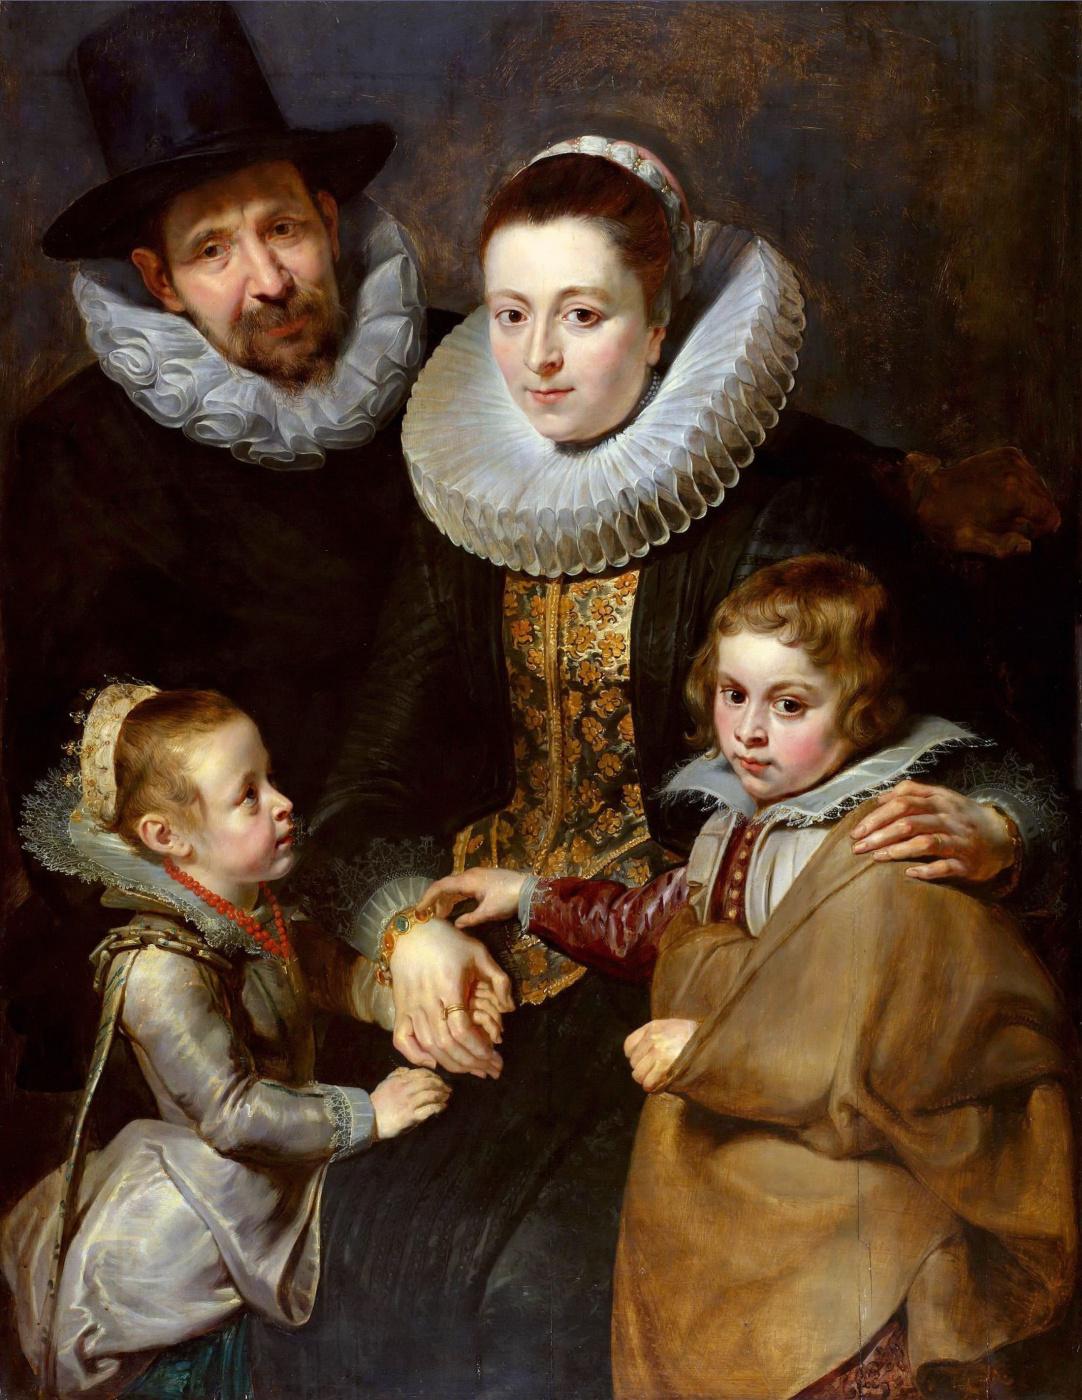 Peter Paul Rubens. The Family Of Jan Brueghel The Elder